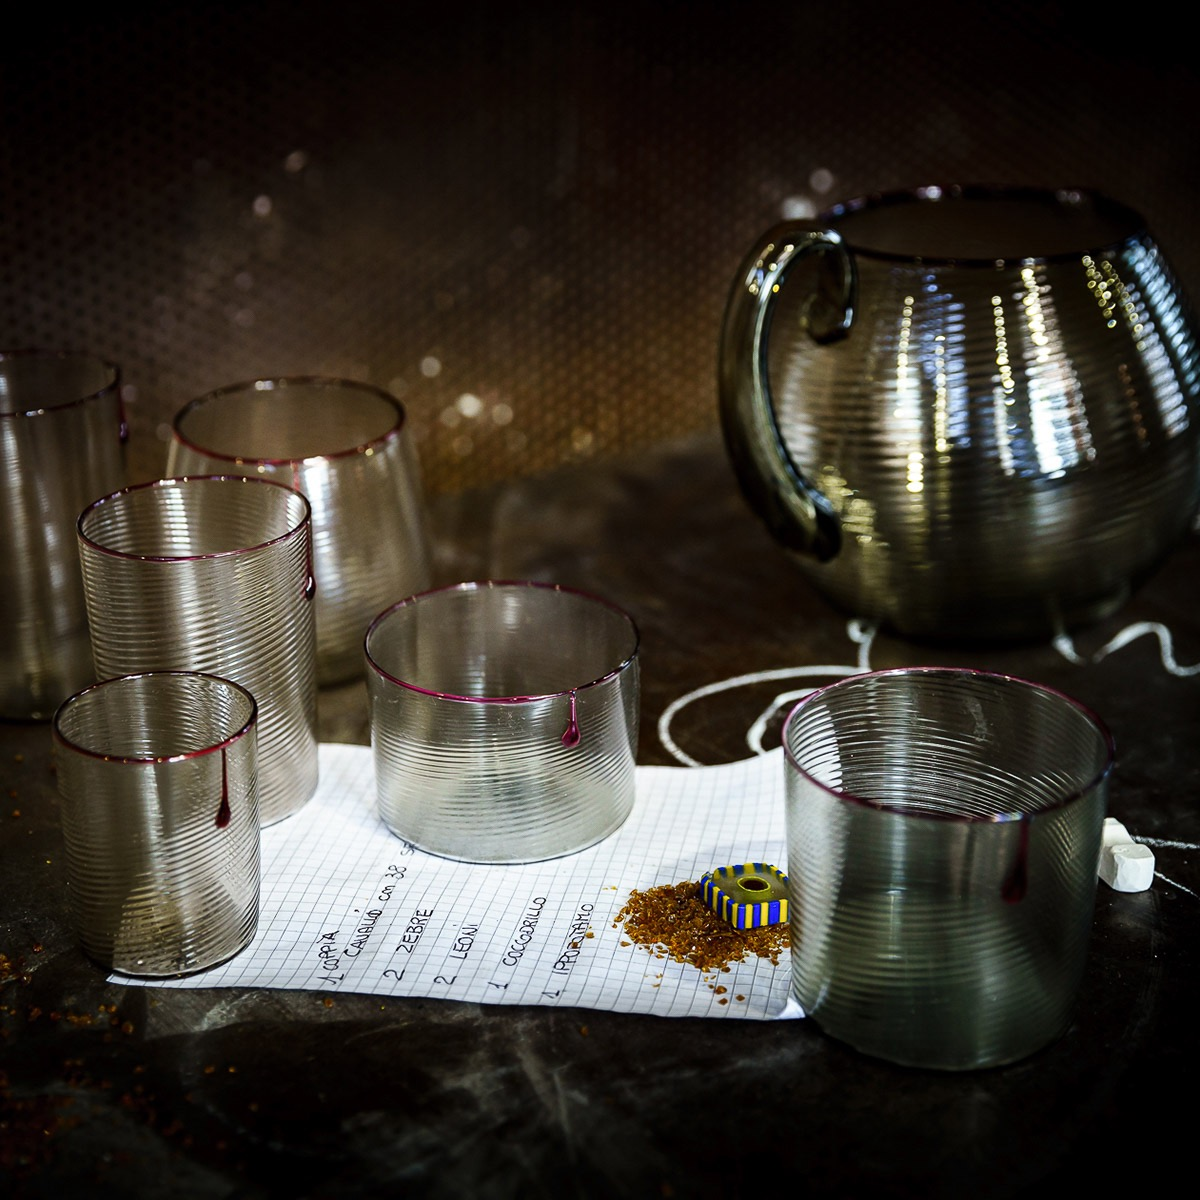 tancredi-glass-murano-design-giberto-luxury-handmade-wine-drink-tear-drop-venice